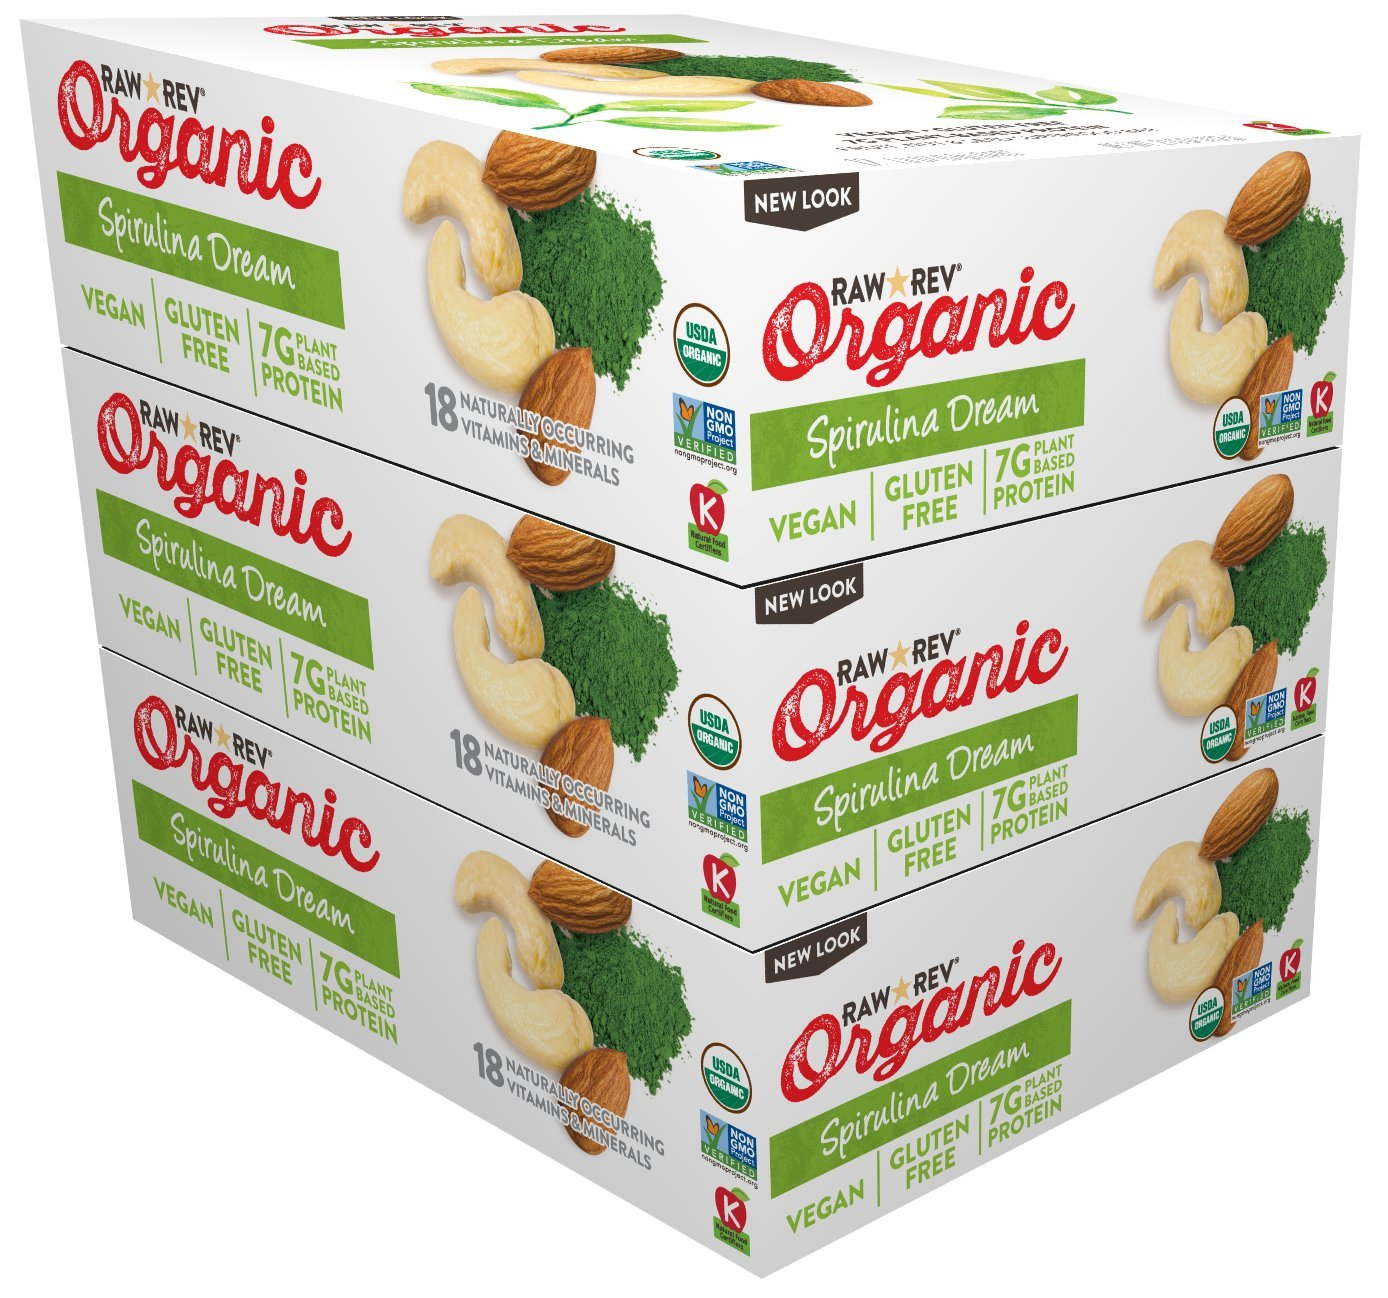 Raw Rev Organic Vegan, Gluten-Free Fruit, Nut, Seed Bars – Spirulina Dream 1.8 ounce (Pack of 36)